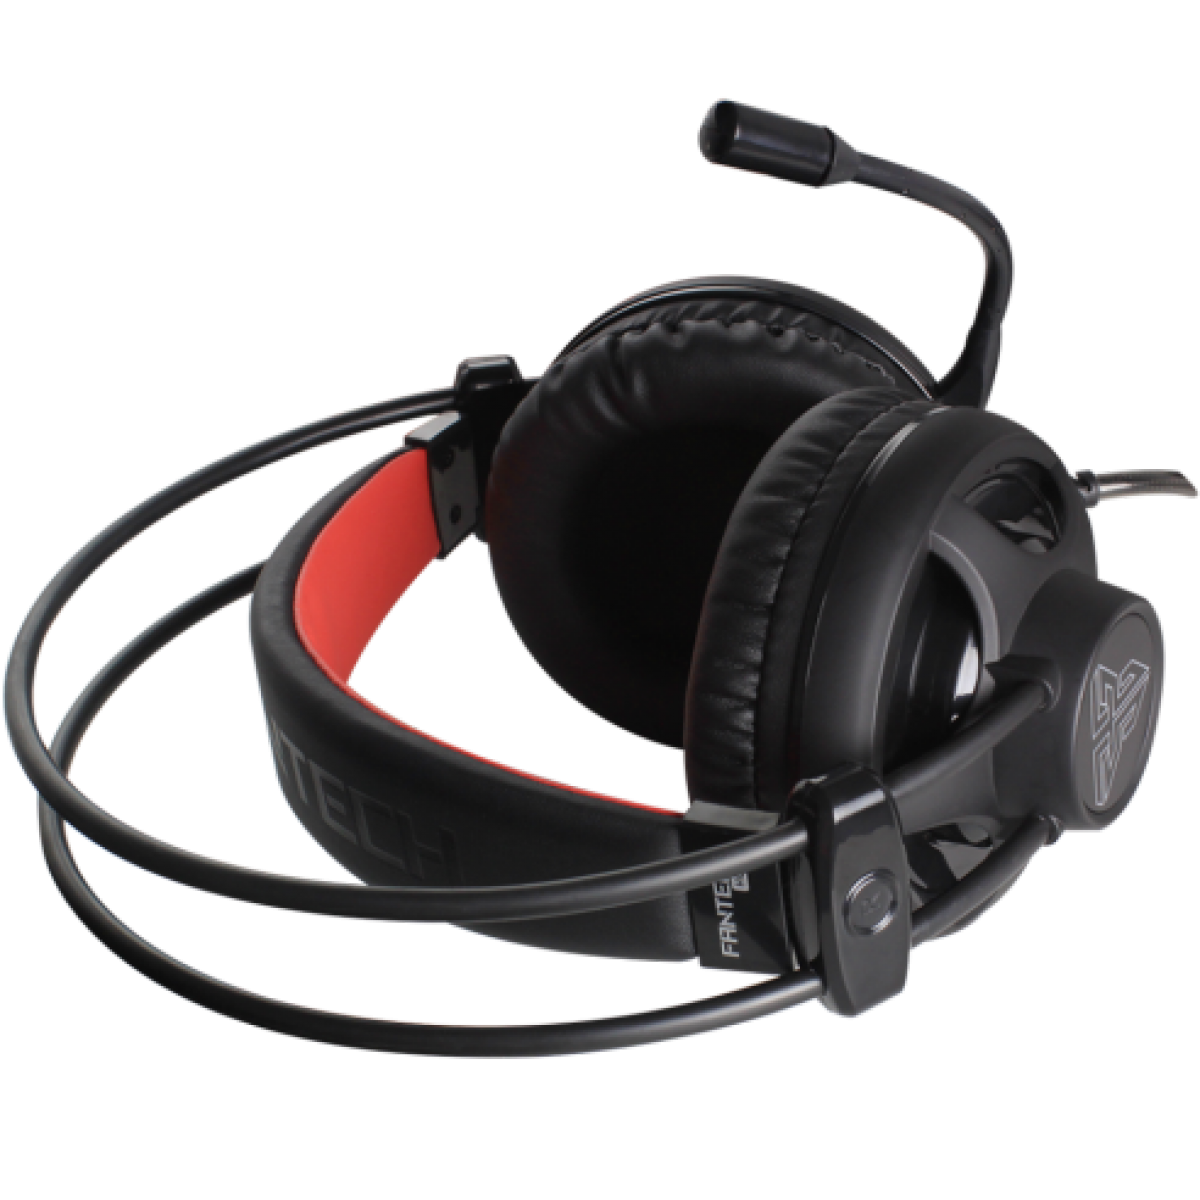 Headset Gamer Fantech Chief, 3.5mm + USB, LED Red, Black, HG13